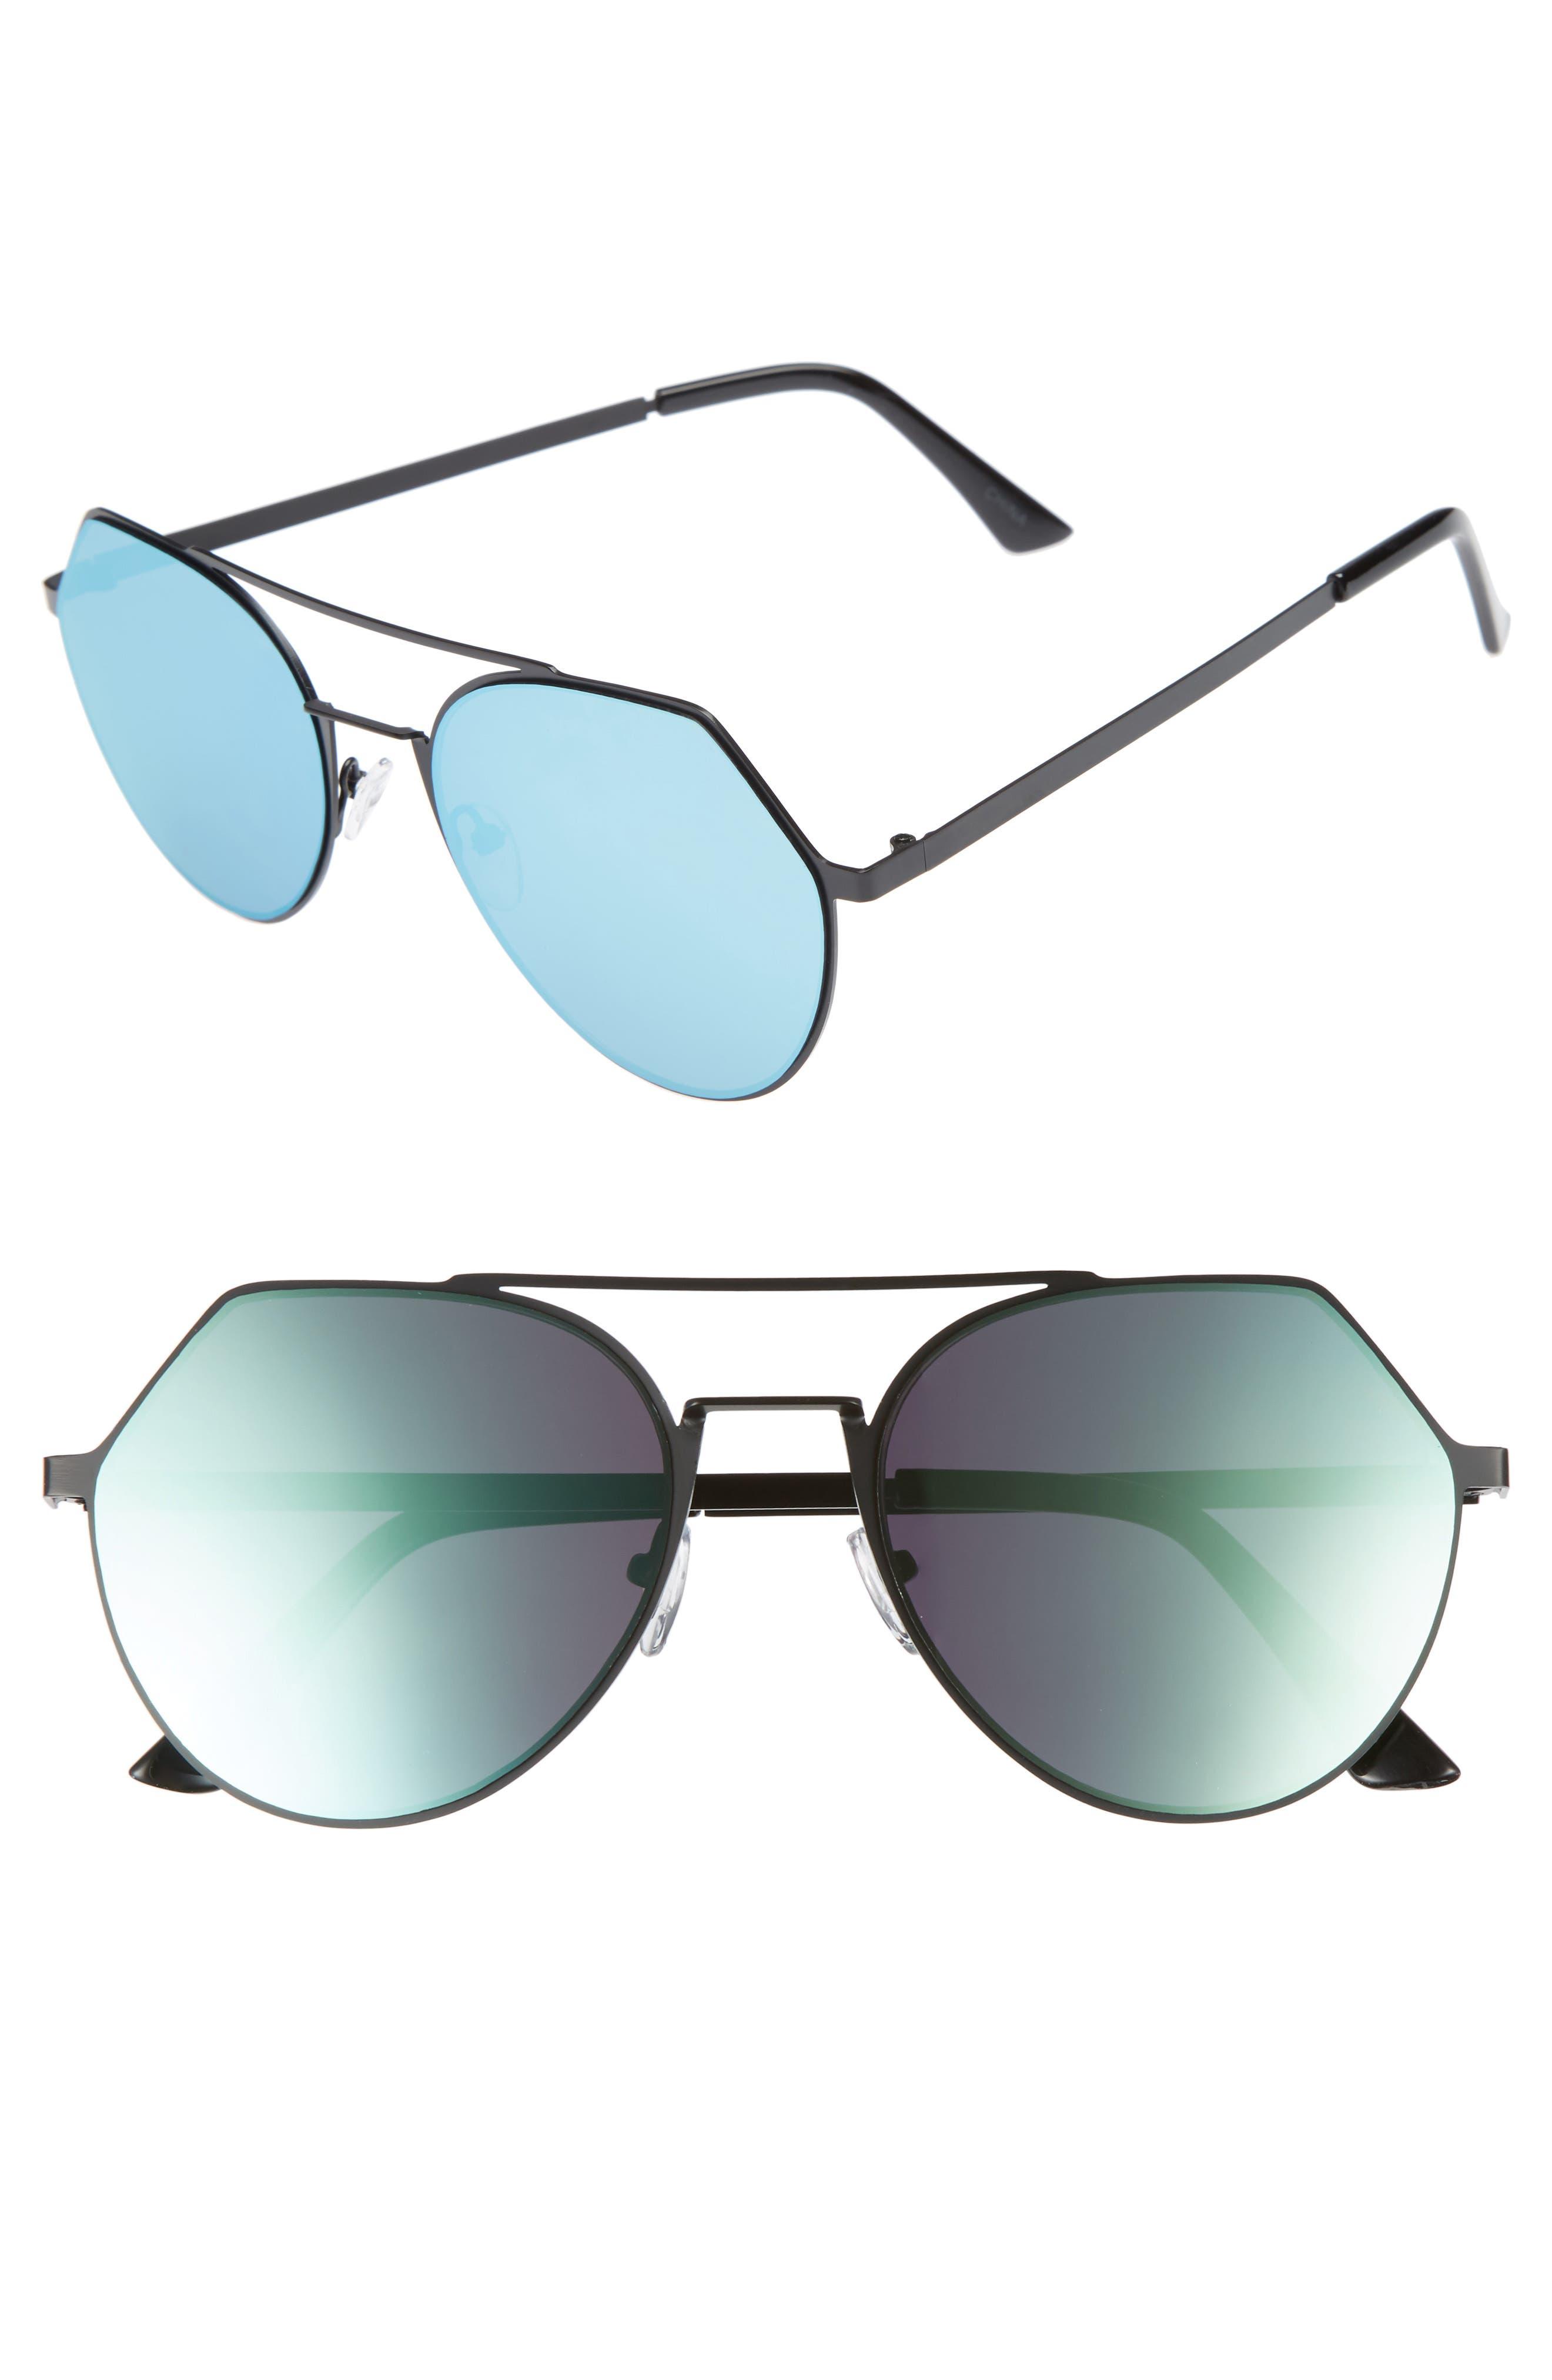 Mirrored Aviator Sunglasses,                             Main thumbnail 1, color,                             001